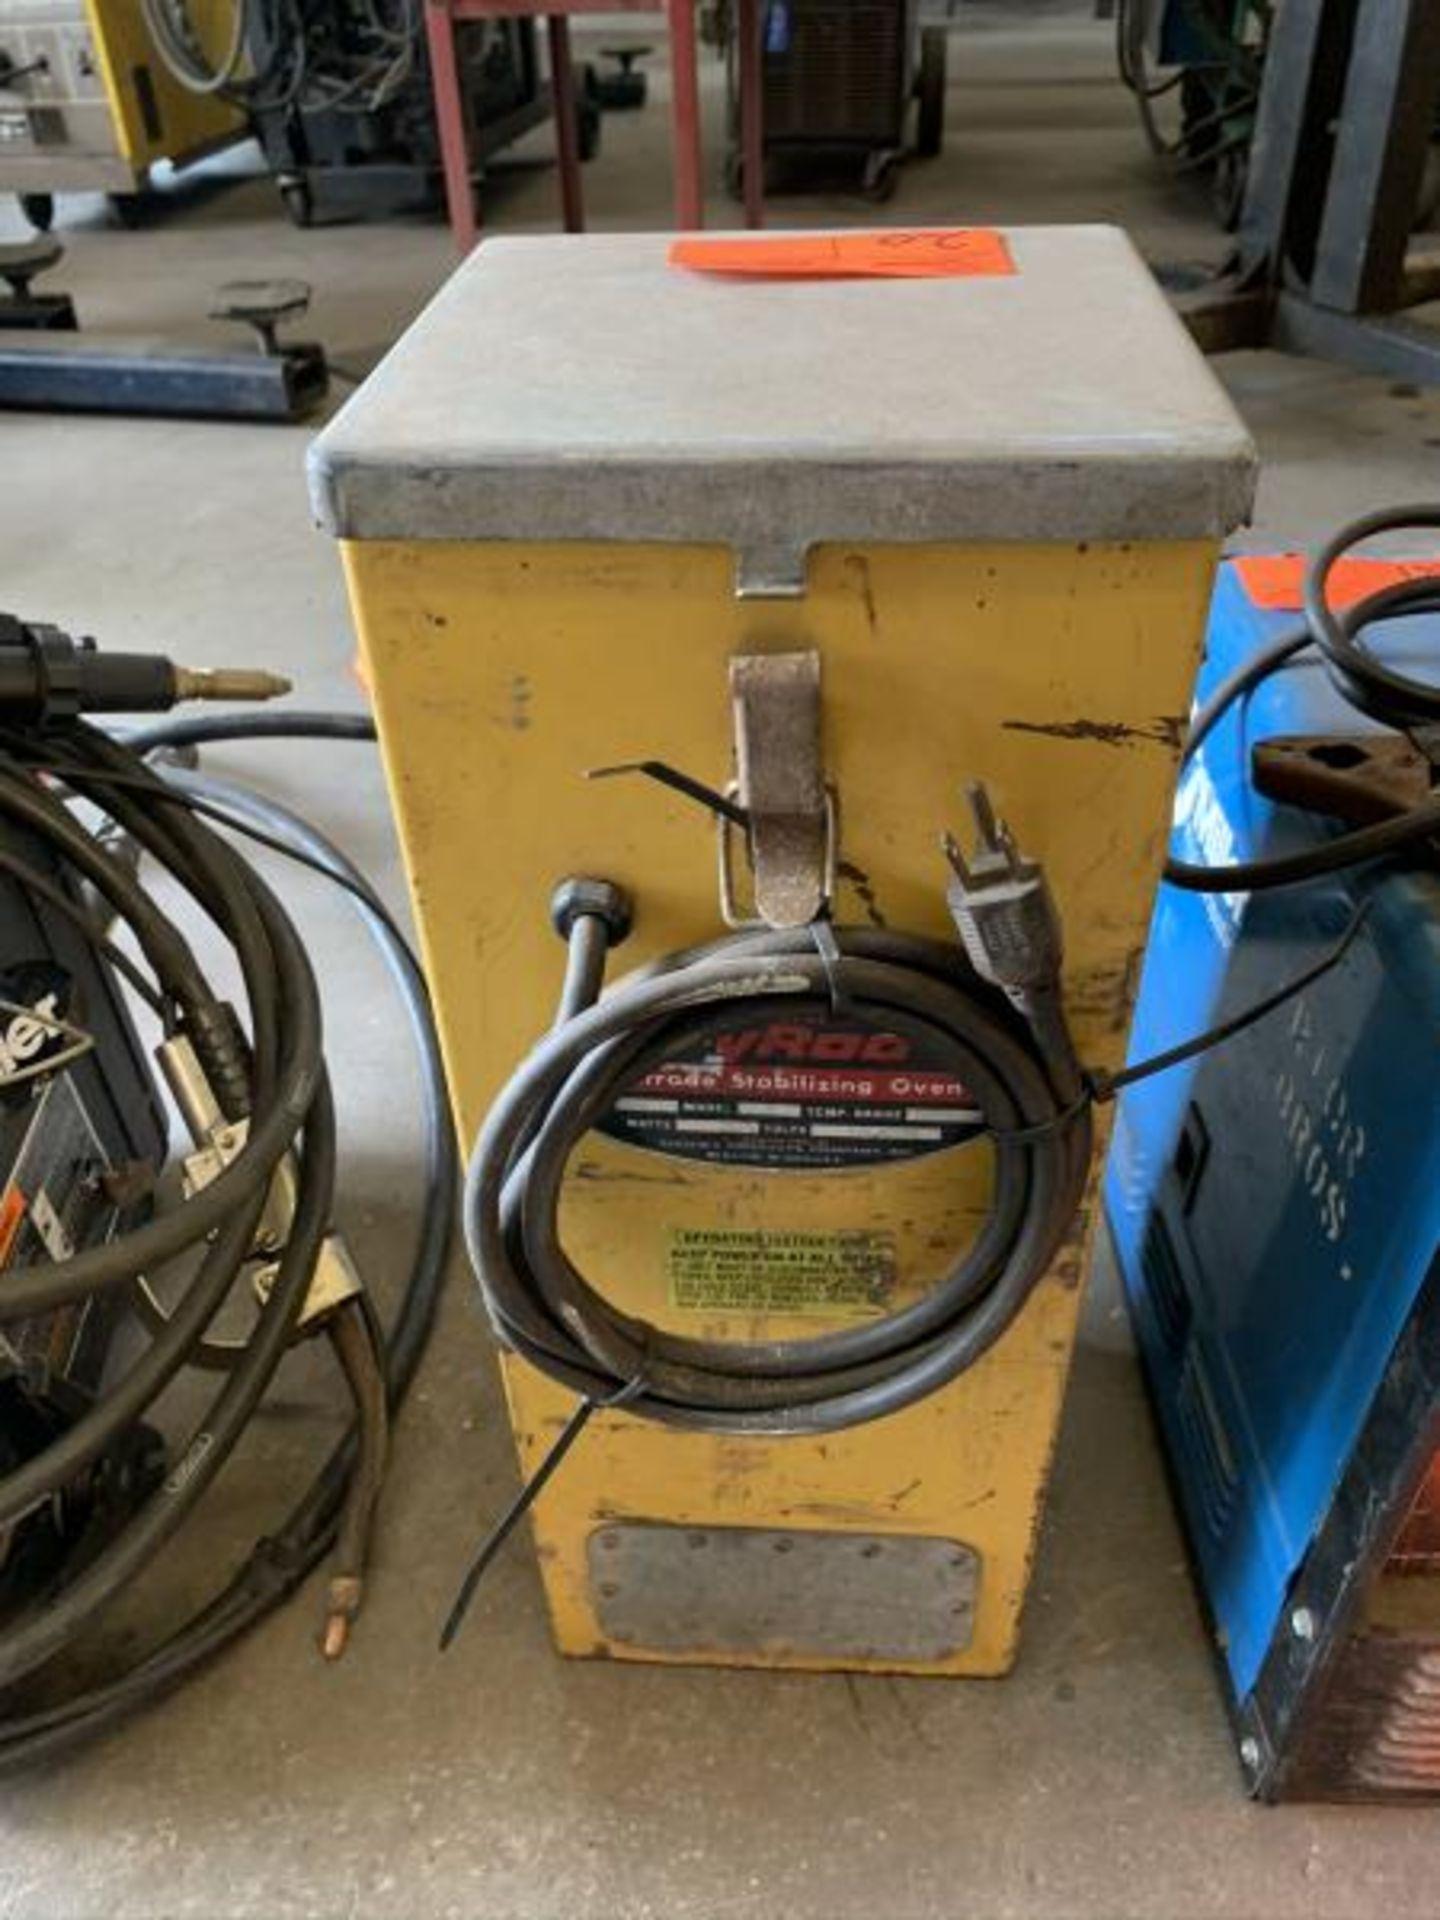 Lot 20 - Phoenix dryroad electrode stabelizing oven M:50A